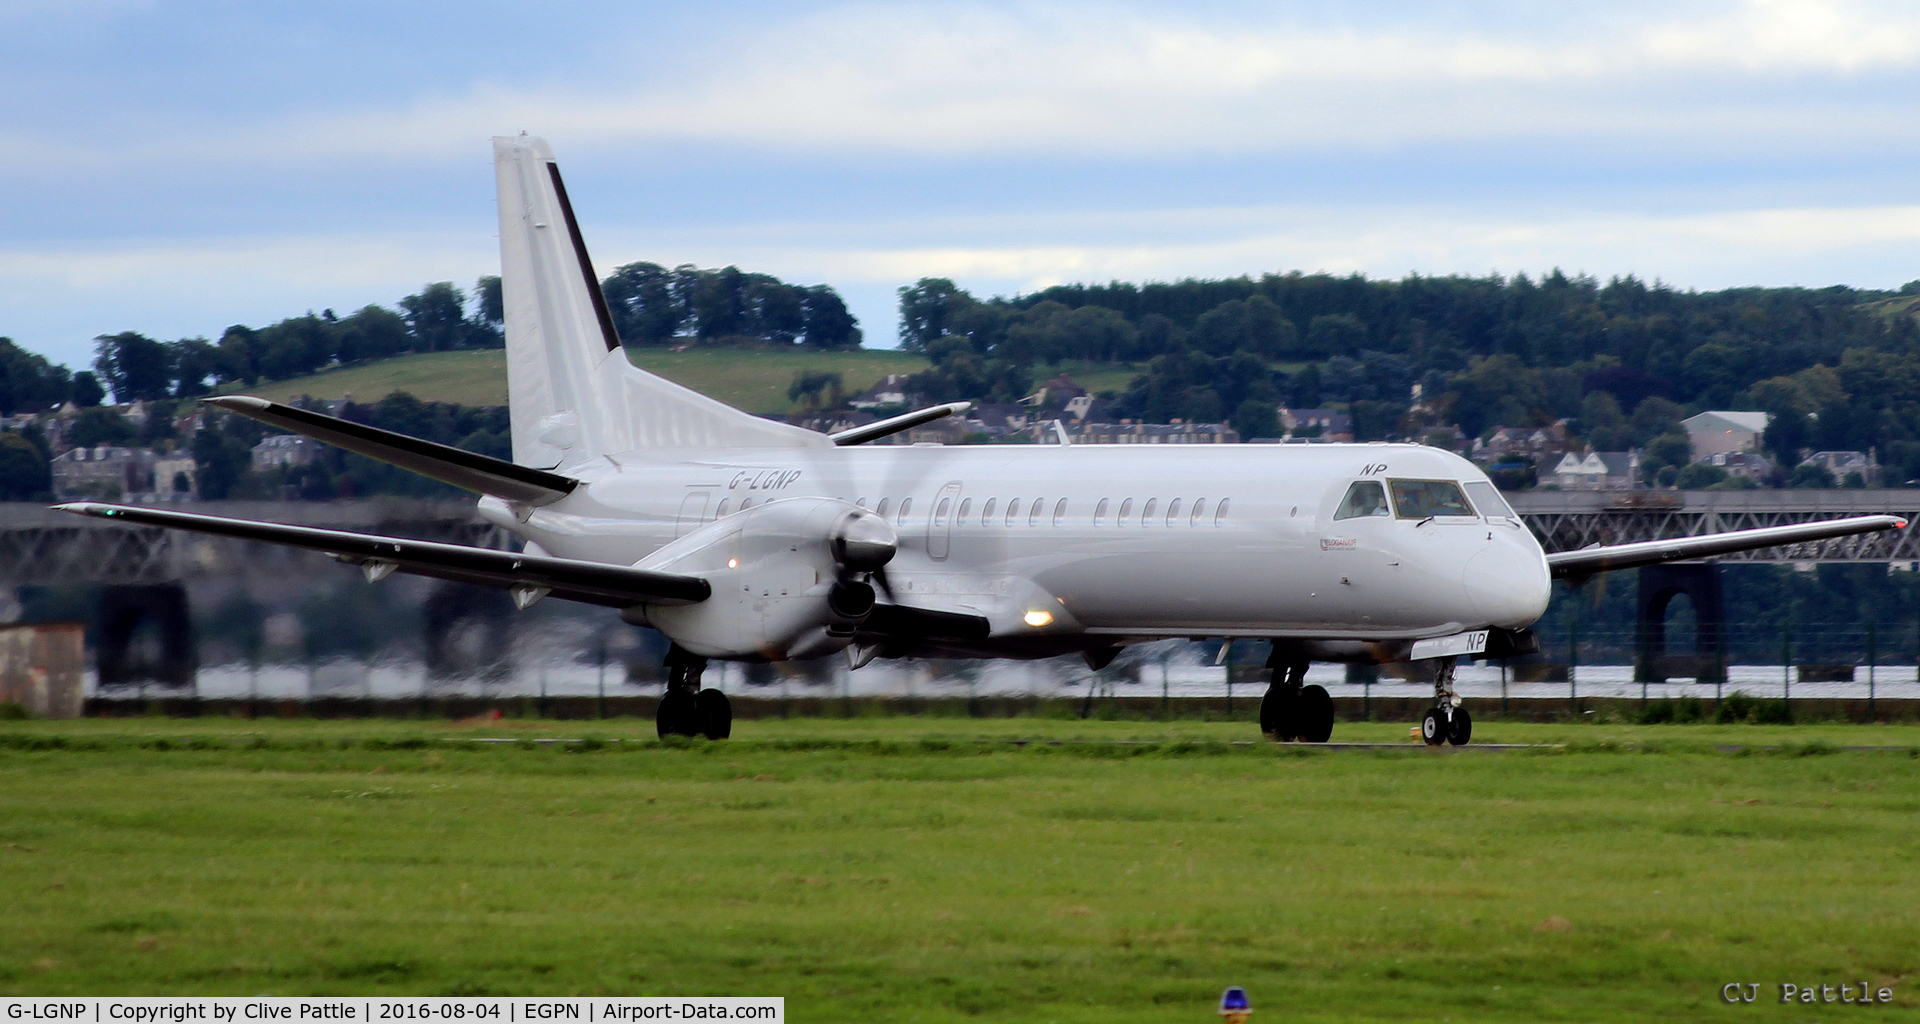 G-LGNP, 1995 Saab 2000 C/N 2000-018, Take off run at Dundee EGPN